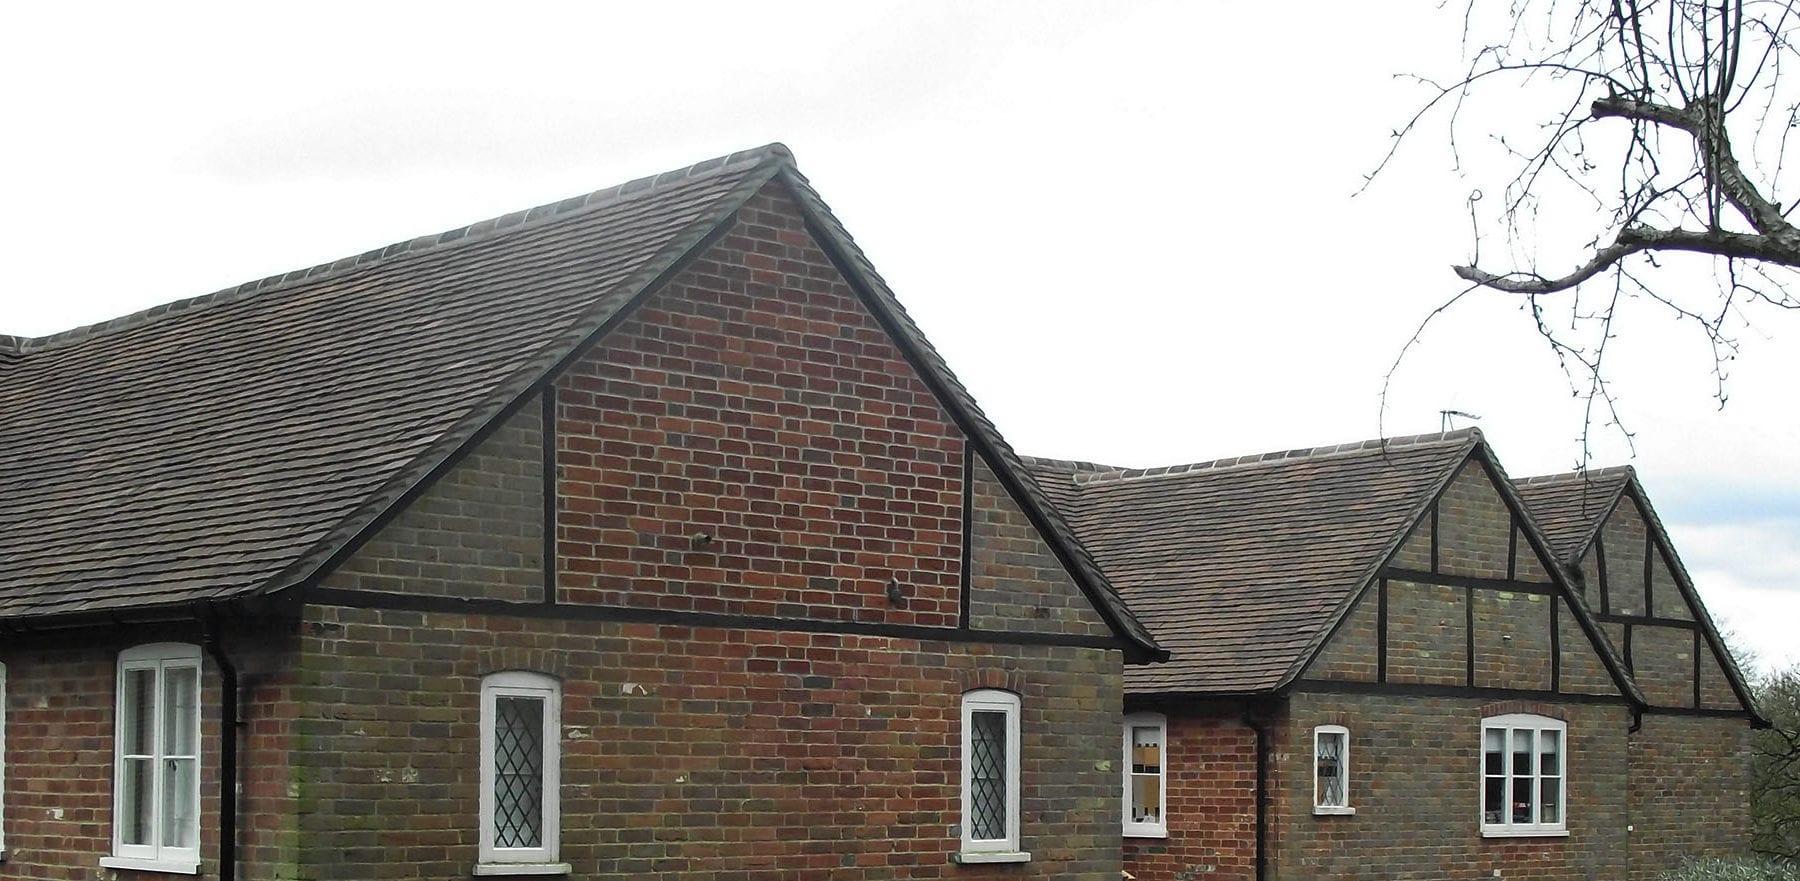 Lifestiles - Handmade Restoration Clay Roof Tiles - Roke, England 3